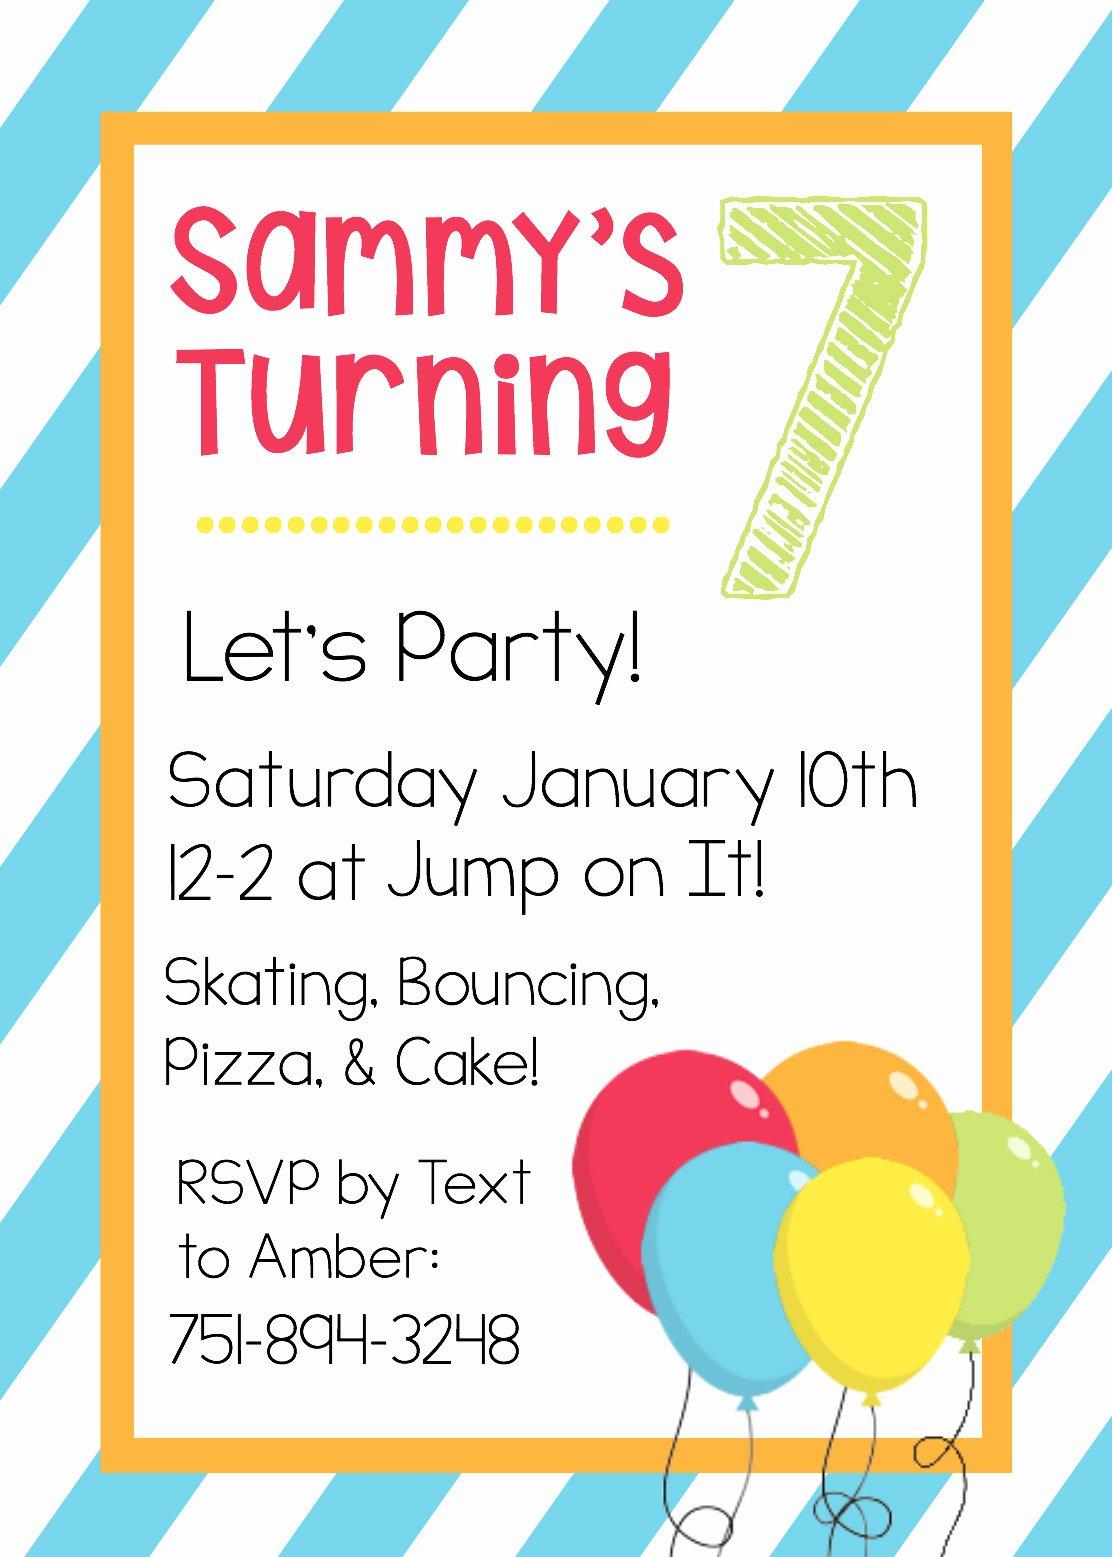 Word Template for Invitations Unique Free Printable Birthday Invitation Templates